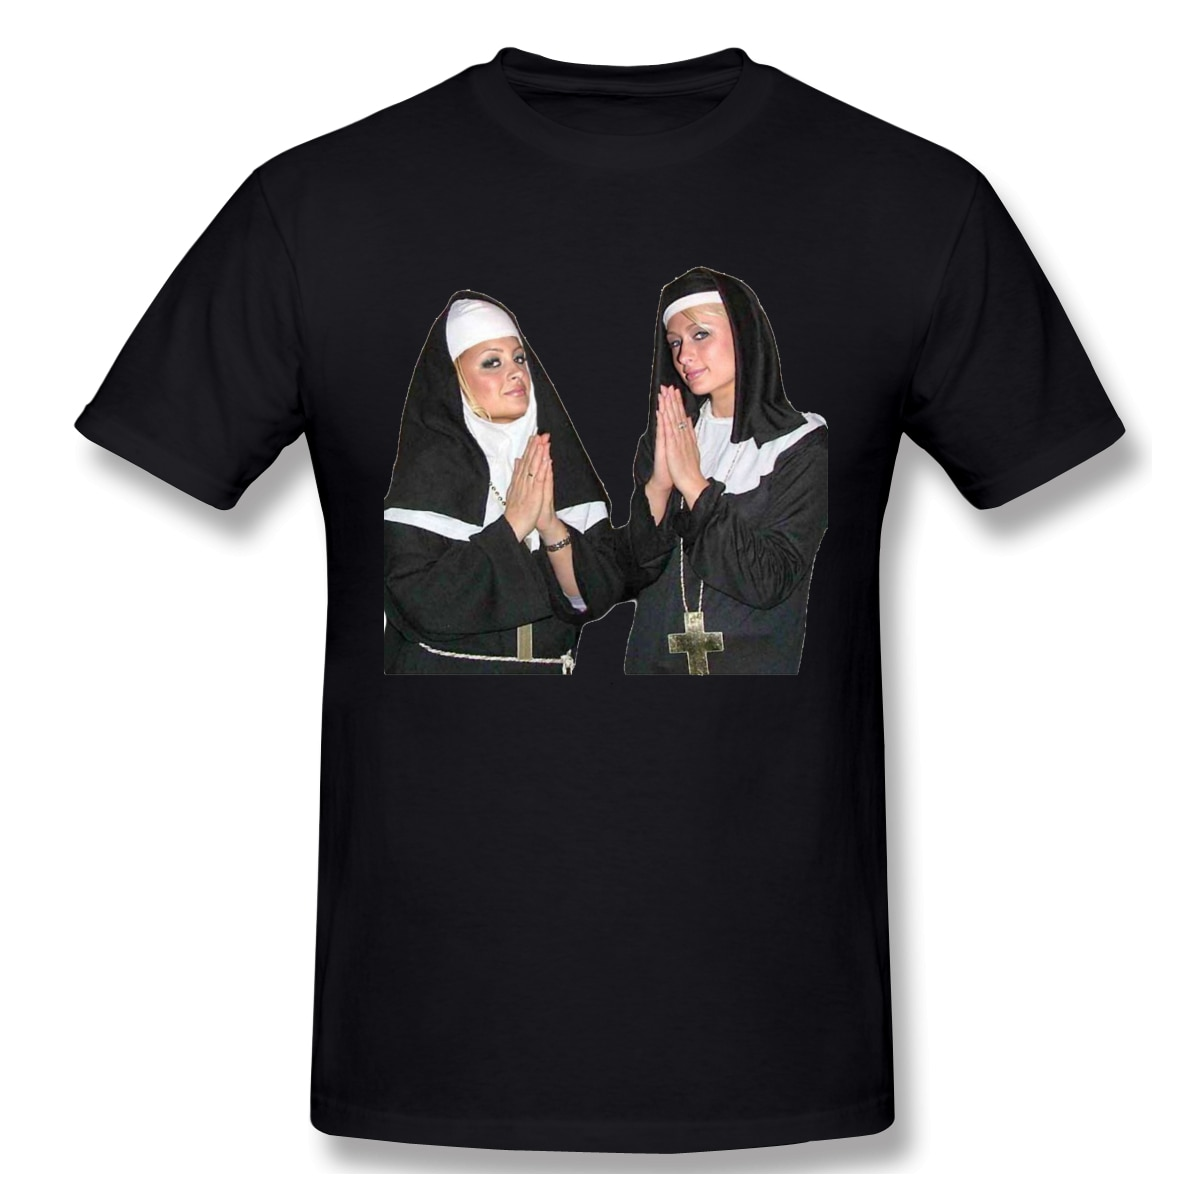 Yüksek kaliteli o-boyun 100 pamuklu üst giyim & Tees bant Saint Paris Hilton ve Nicole Richie T-shirt yaz/sonbahar kollu kısa